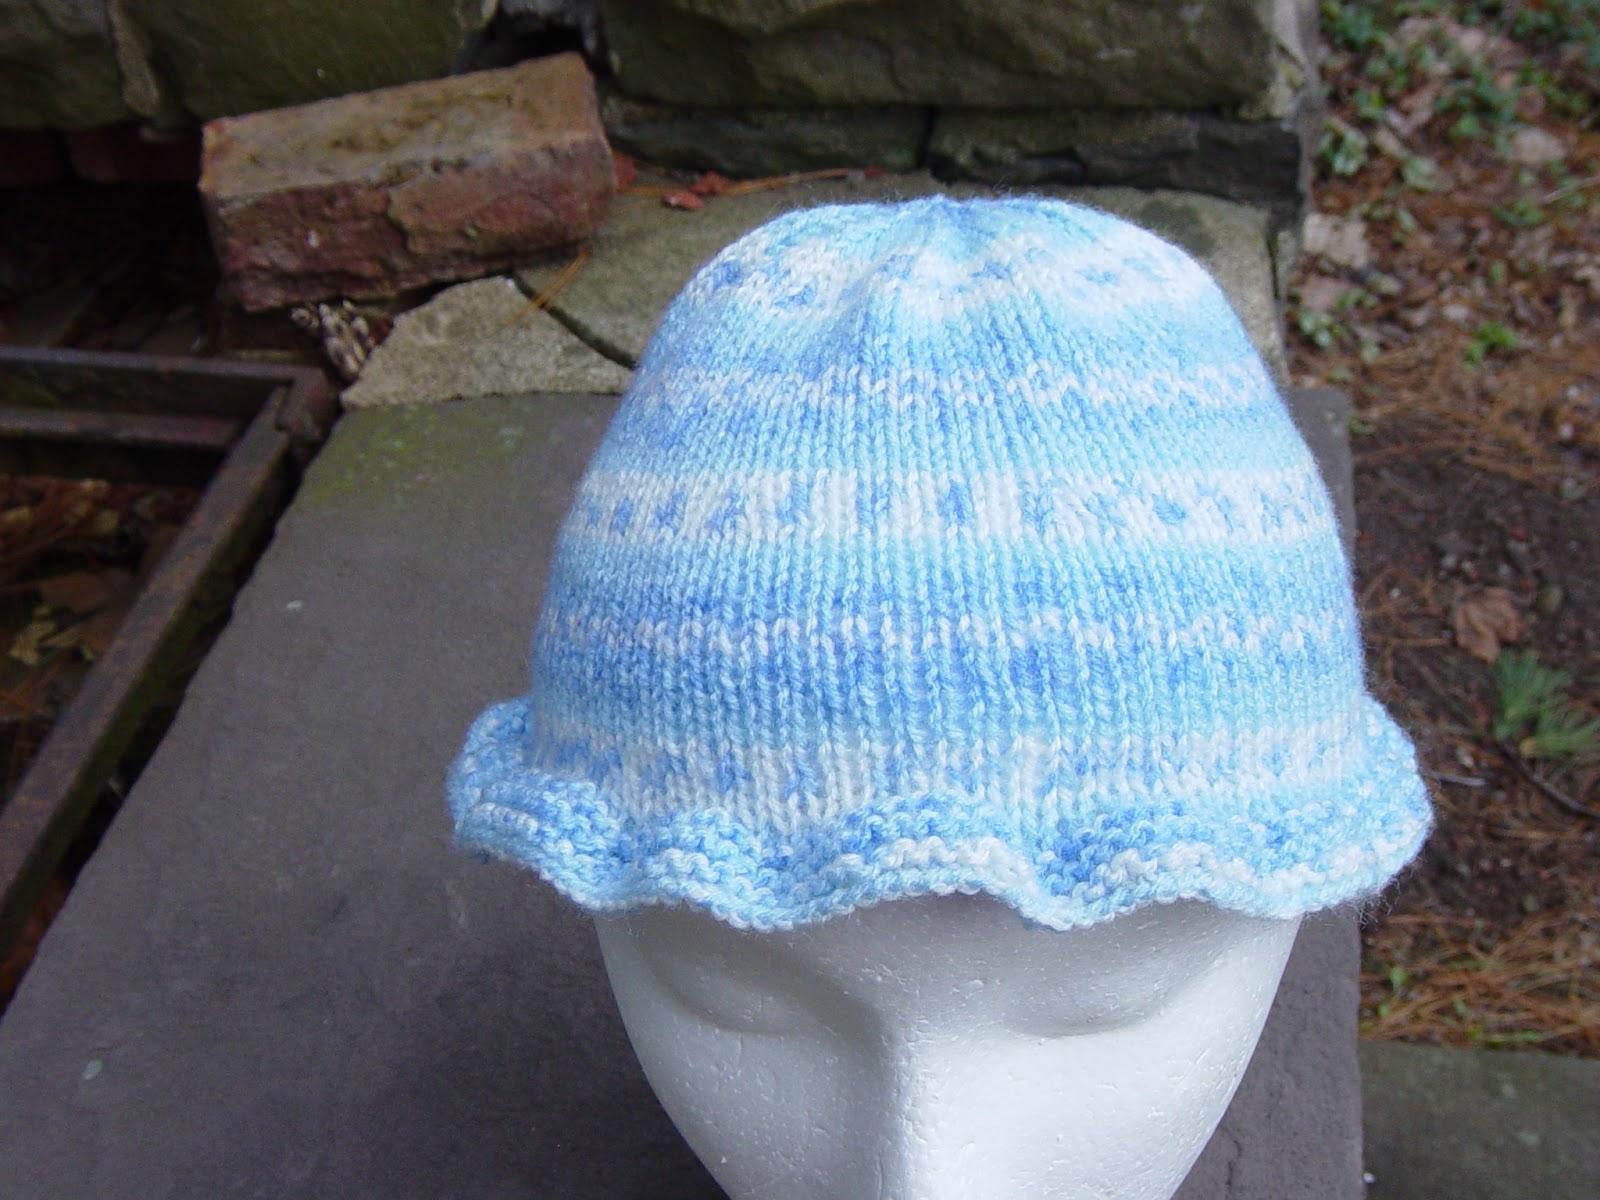 Bernat Baby Jacquards Yarn Knitted Hat Pattern Floral